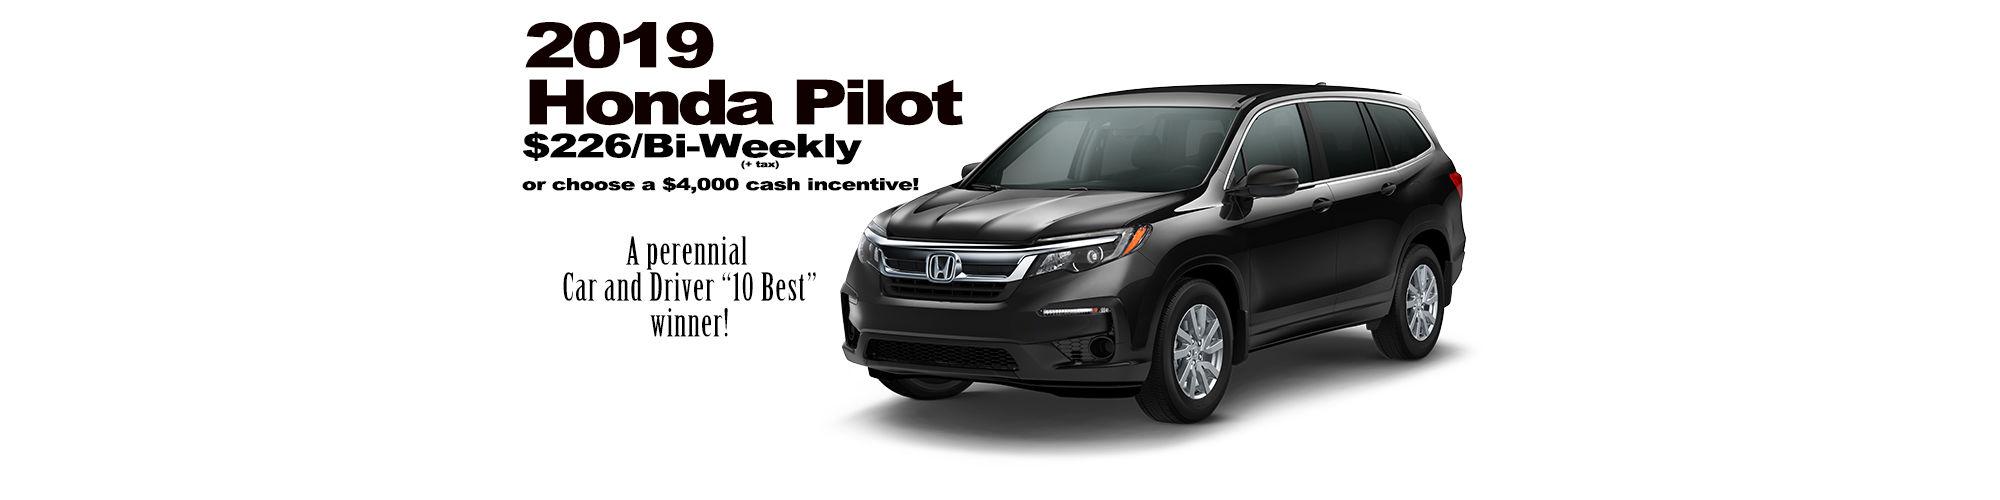 2019 Honda Pilot priced as low as $226 bi-weekly (plus tax) with zero down!